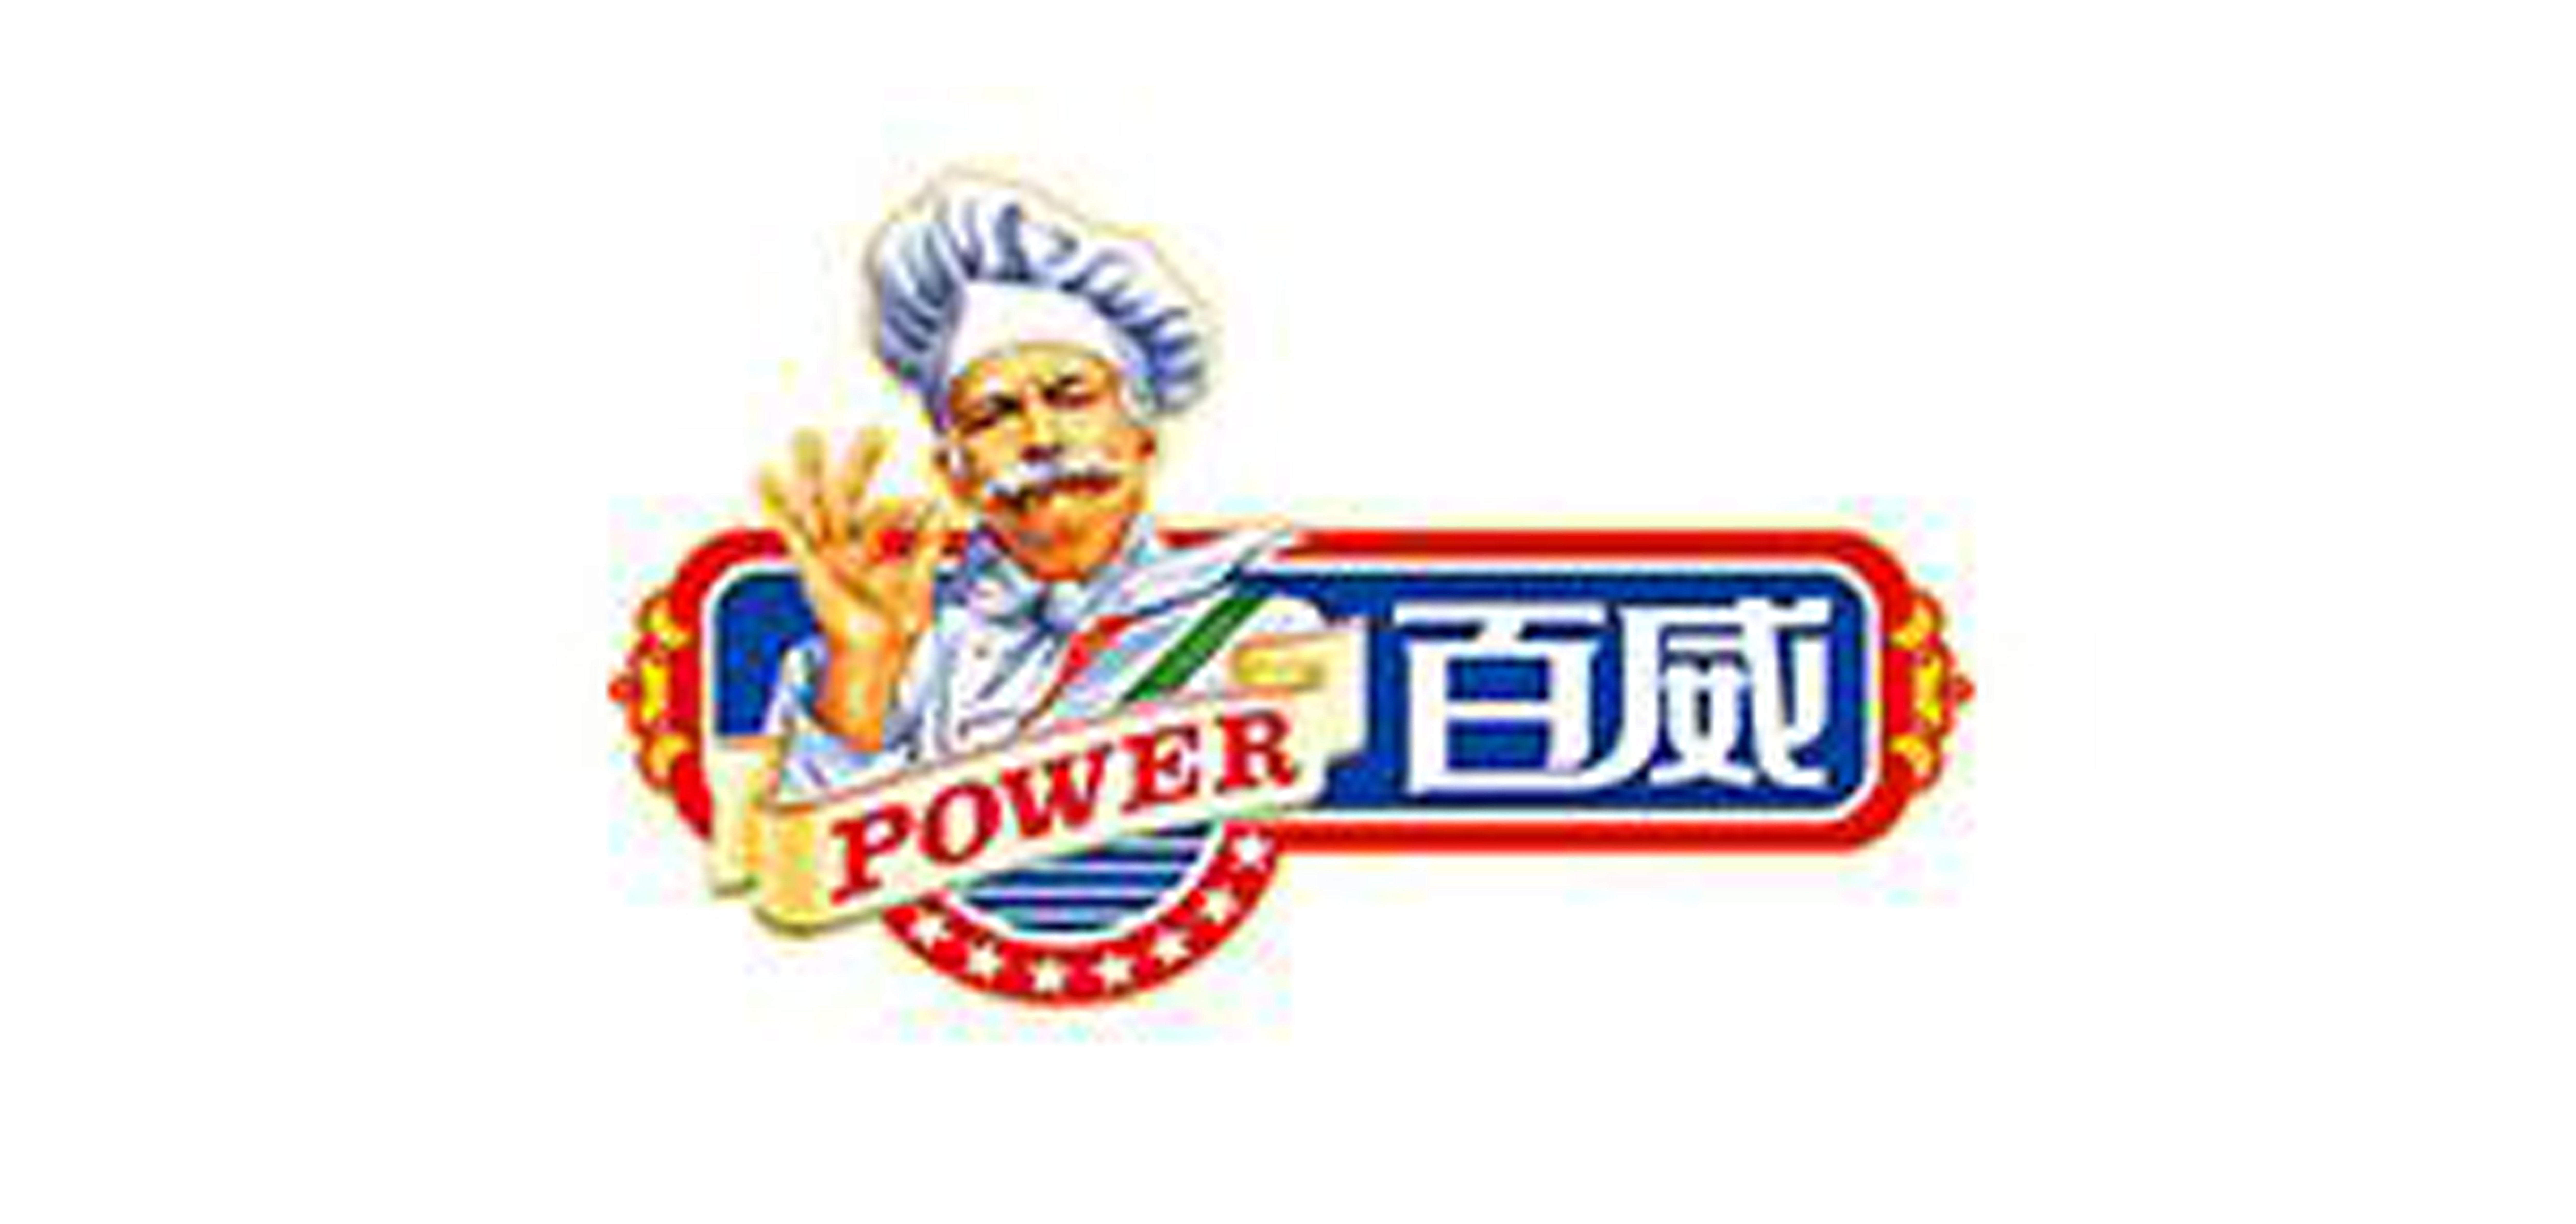 Power是什么牌子_百威品牌怎么样?